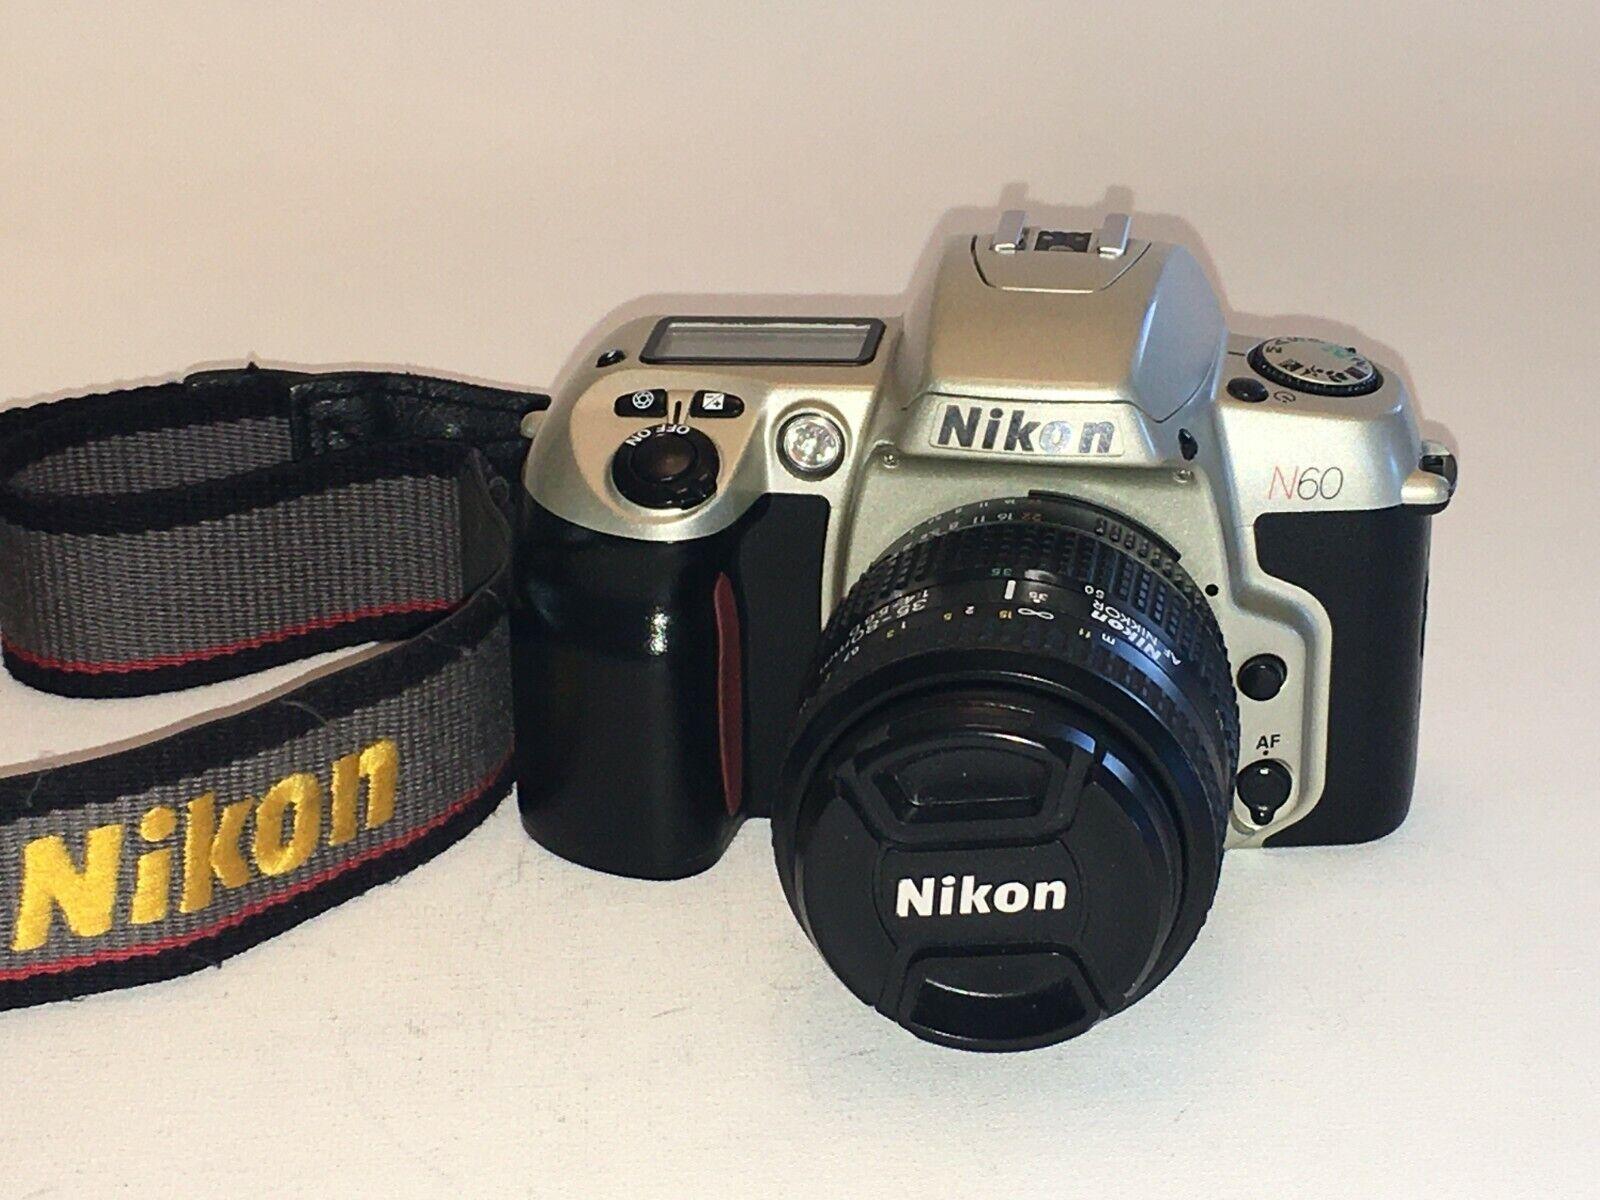 Nikon N60 35mm SLR Film Camera With 35-80 Mm Lens Strap Attn Film People - $49.95